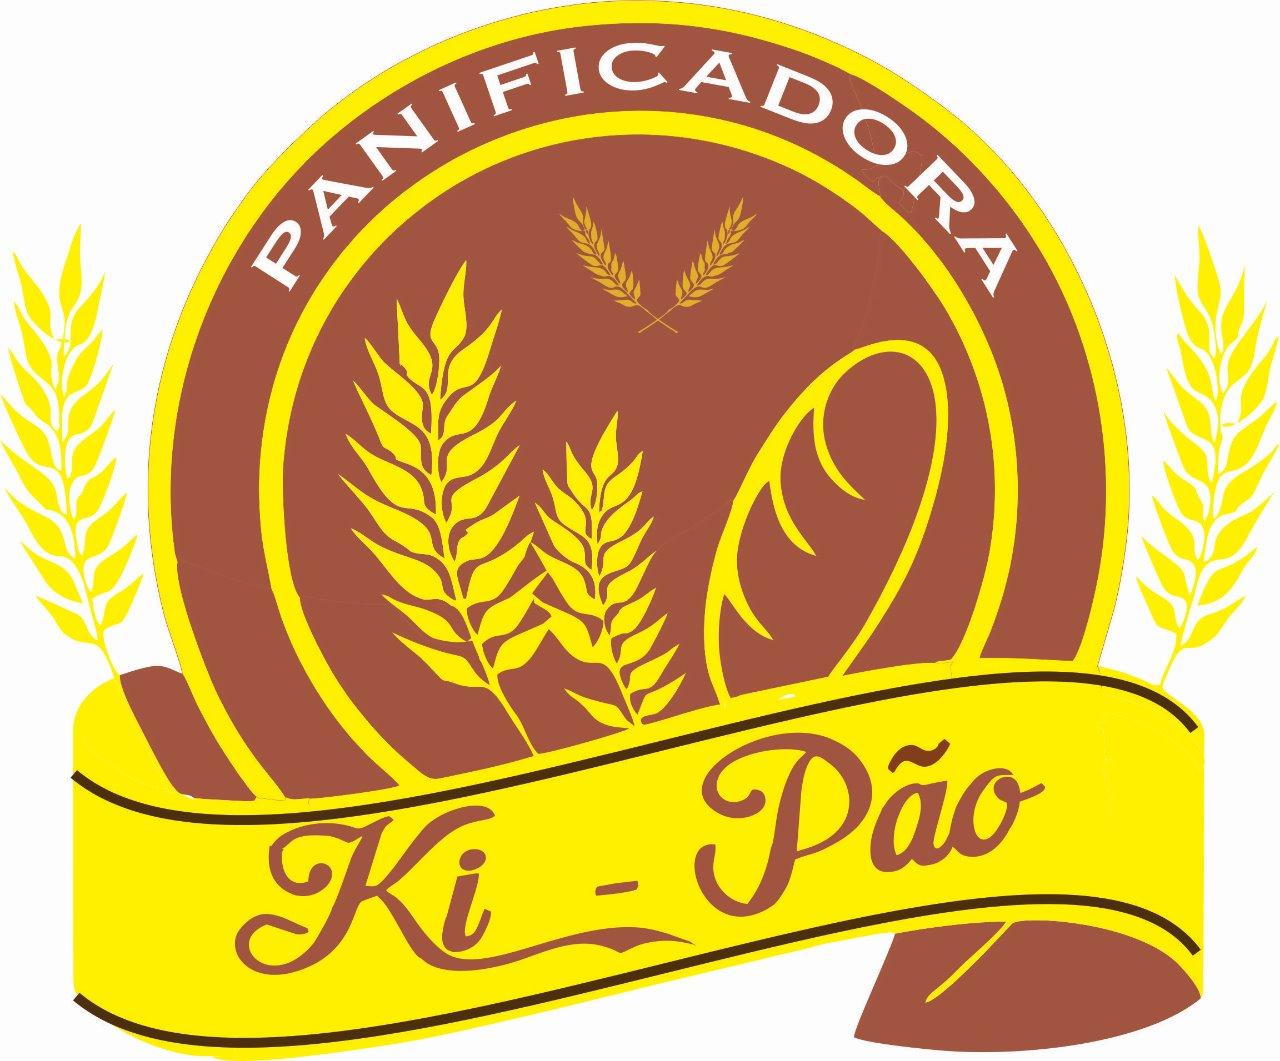 Panificadora Ki-Pão